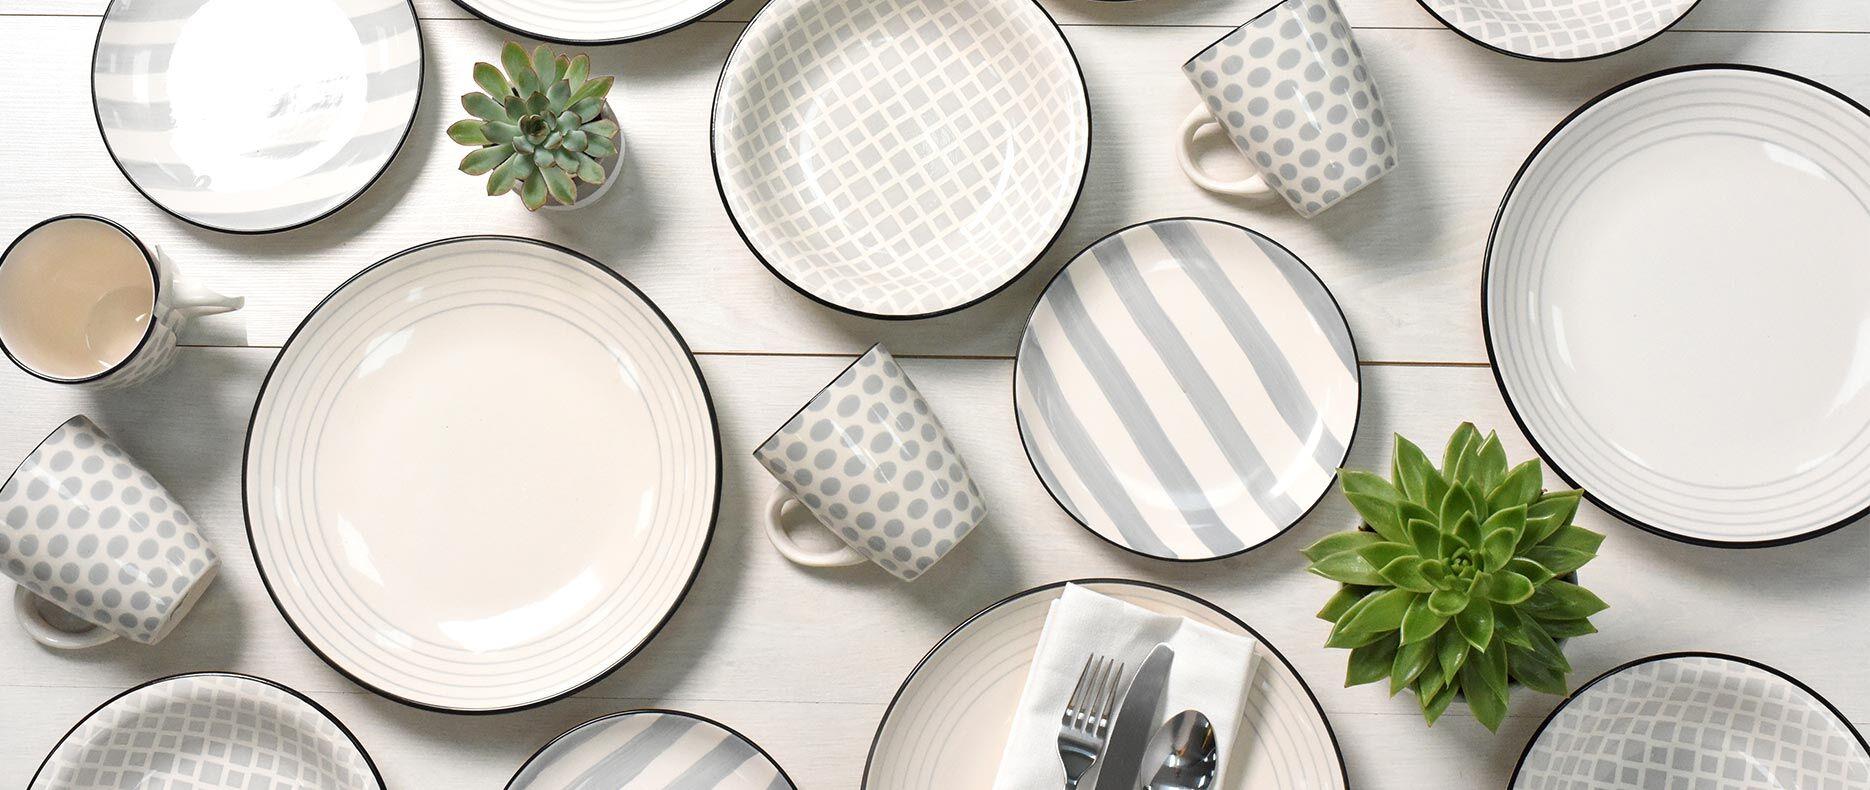 Salcombe Stoneware Set on dinning table